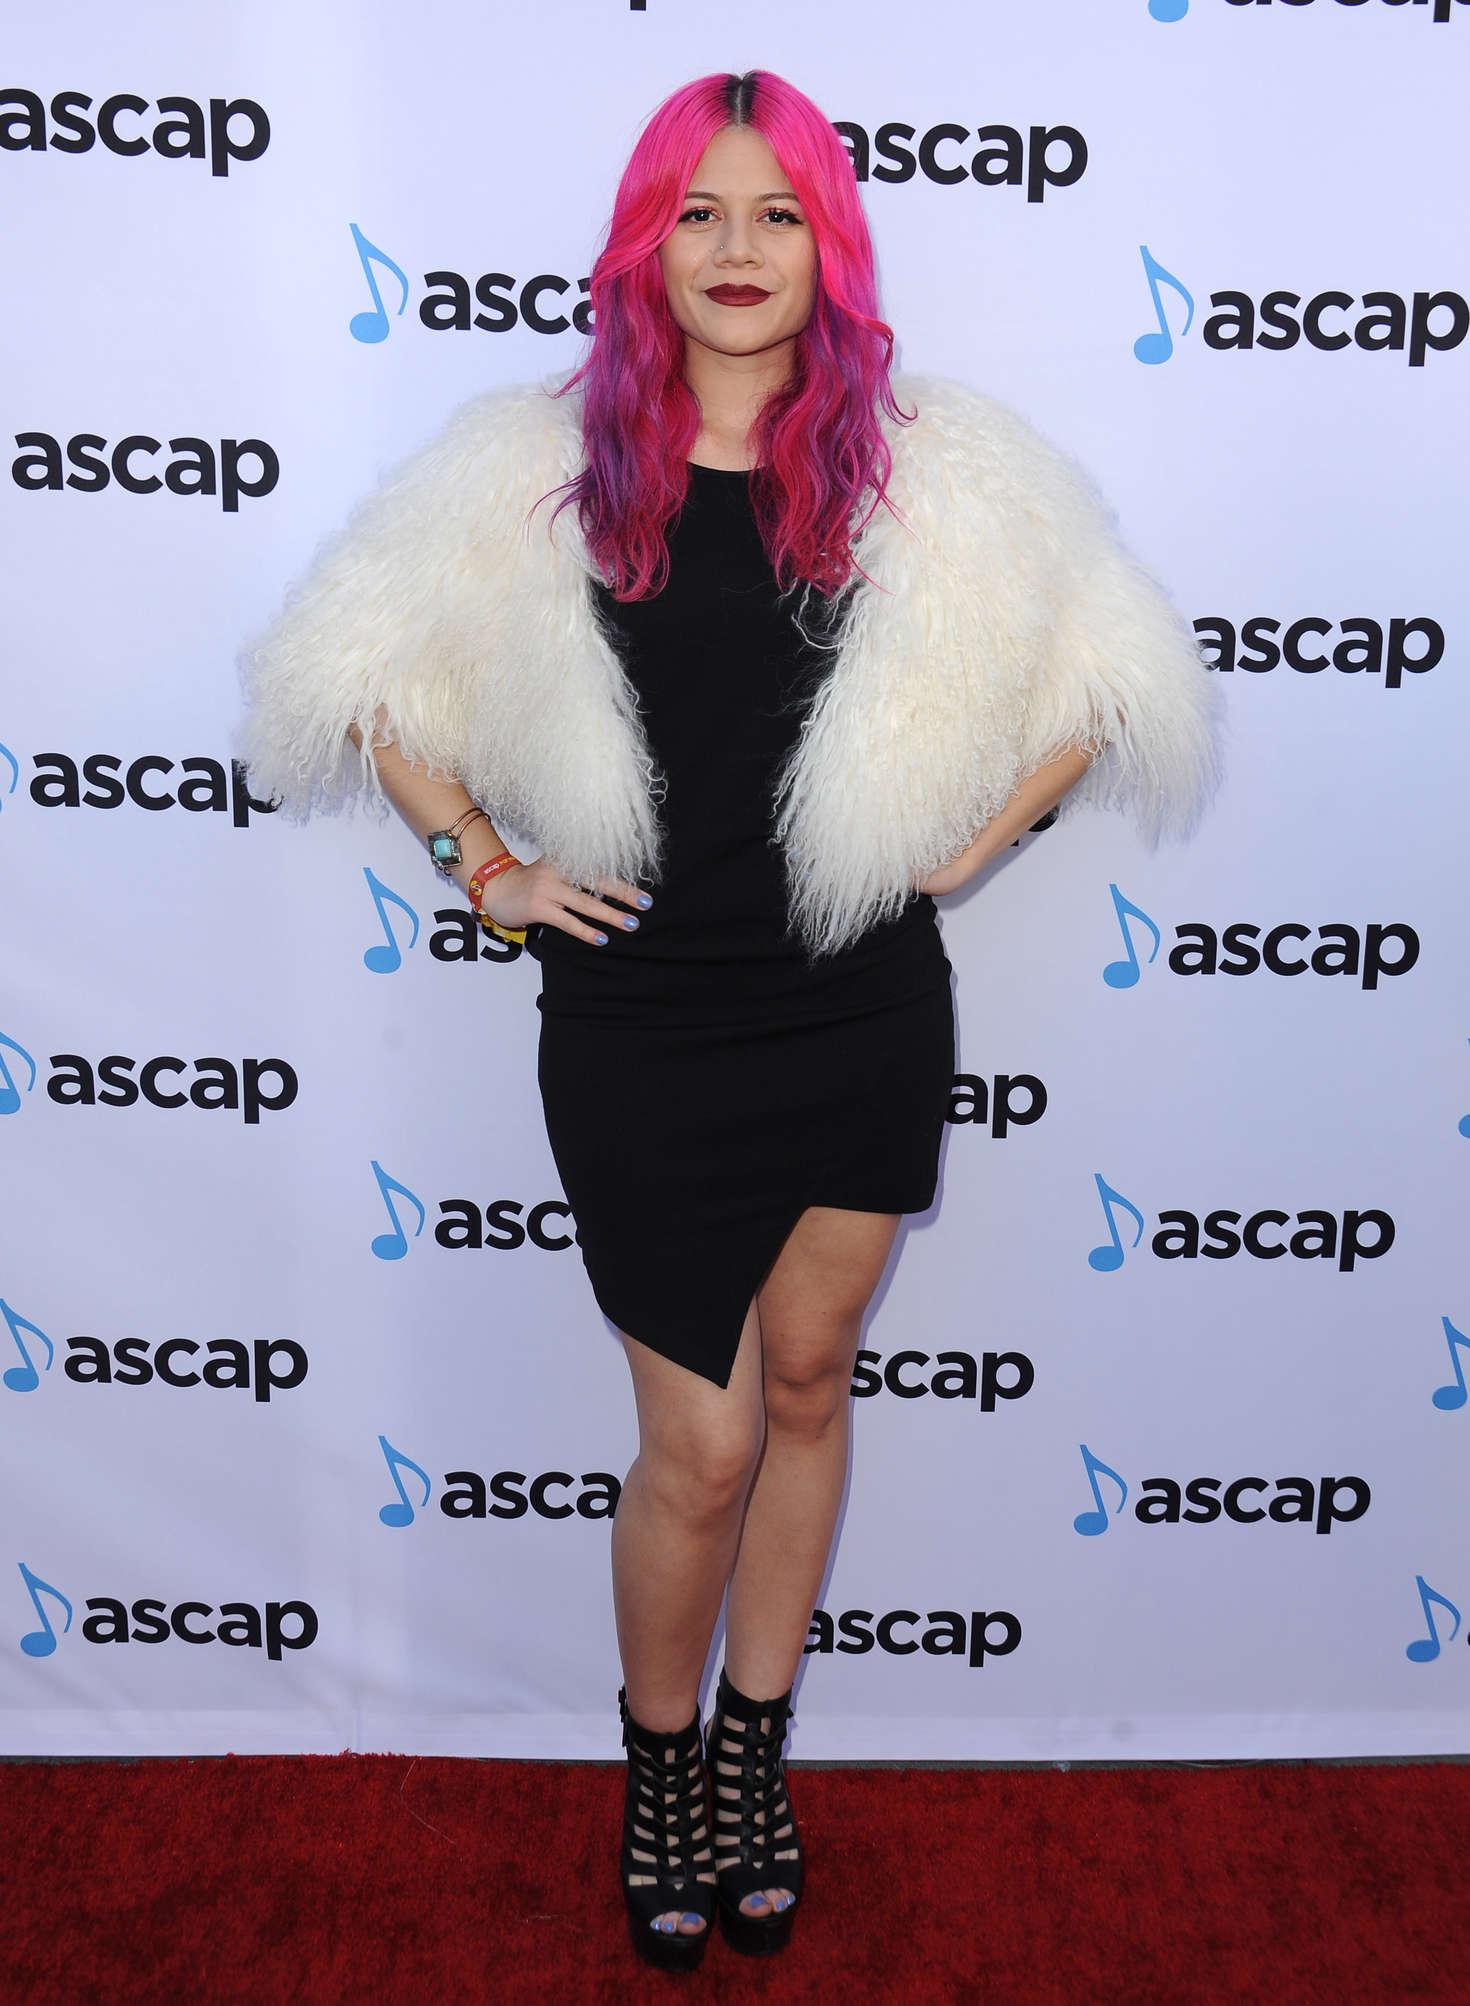 Allison Iraheta - 33rd Annual ASCAP Pop Music Awards in Hollywood